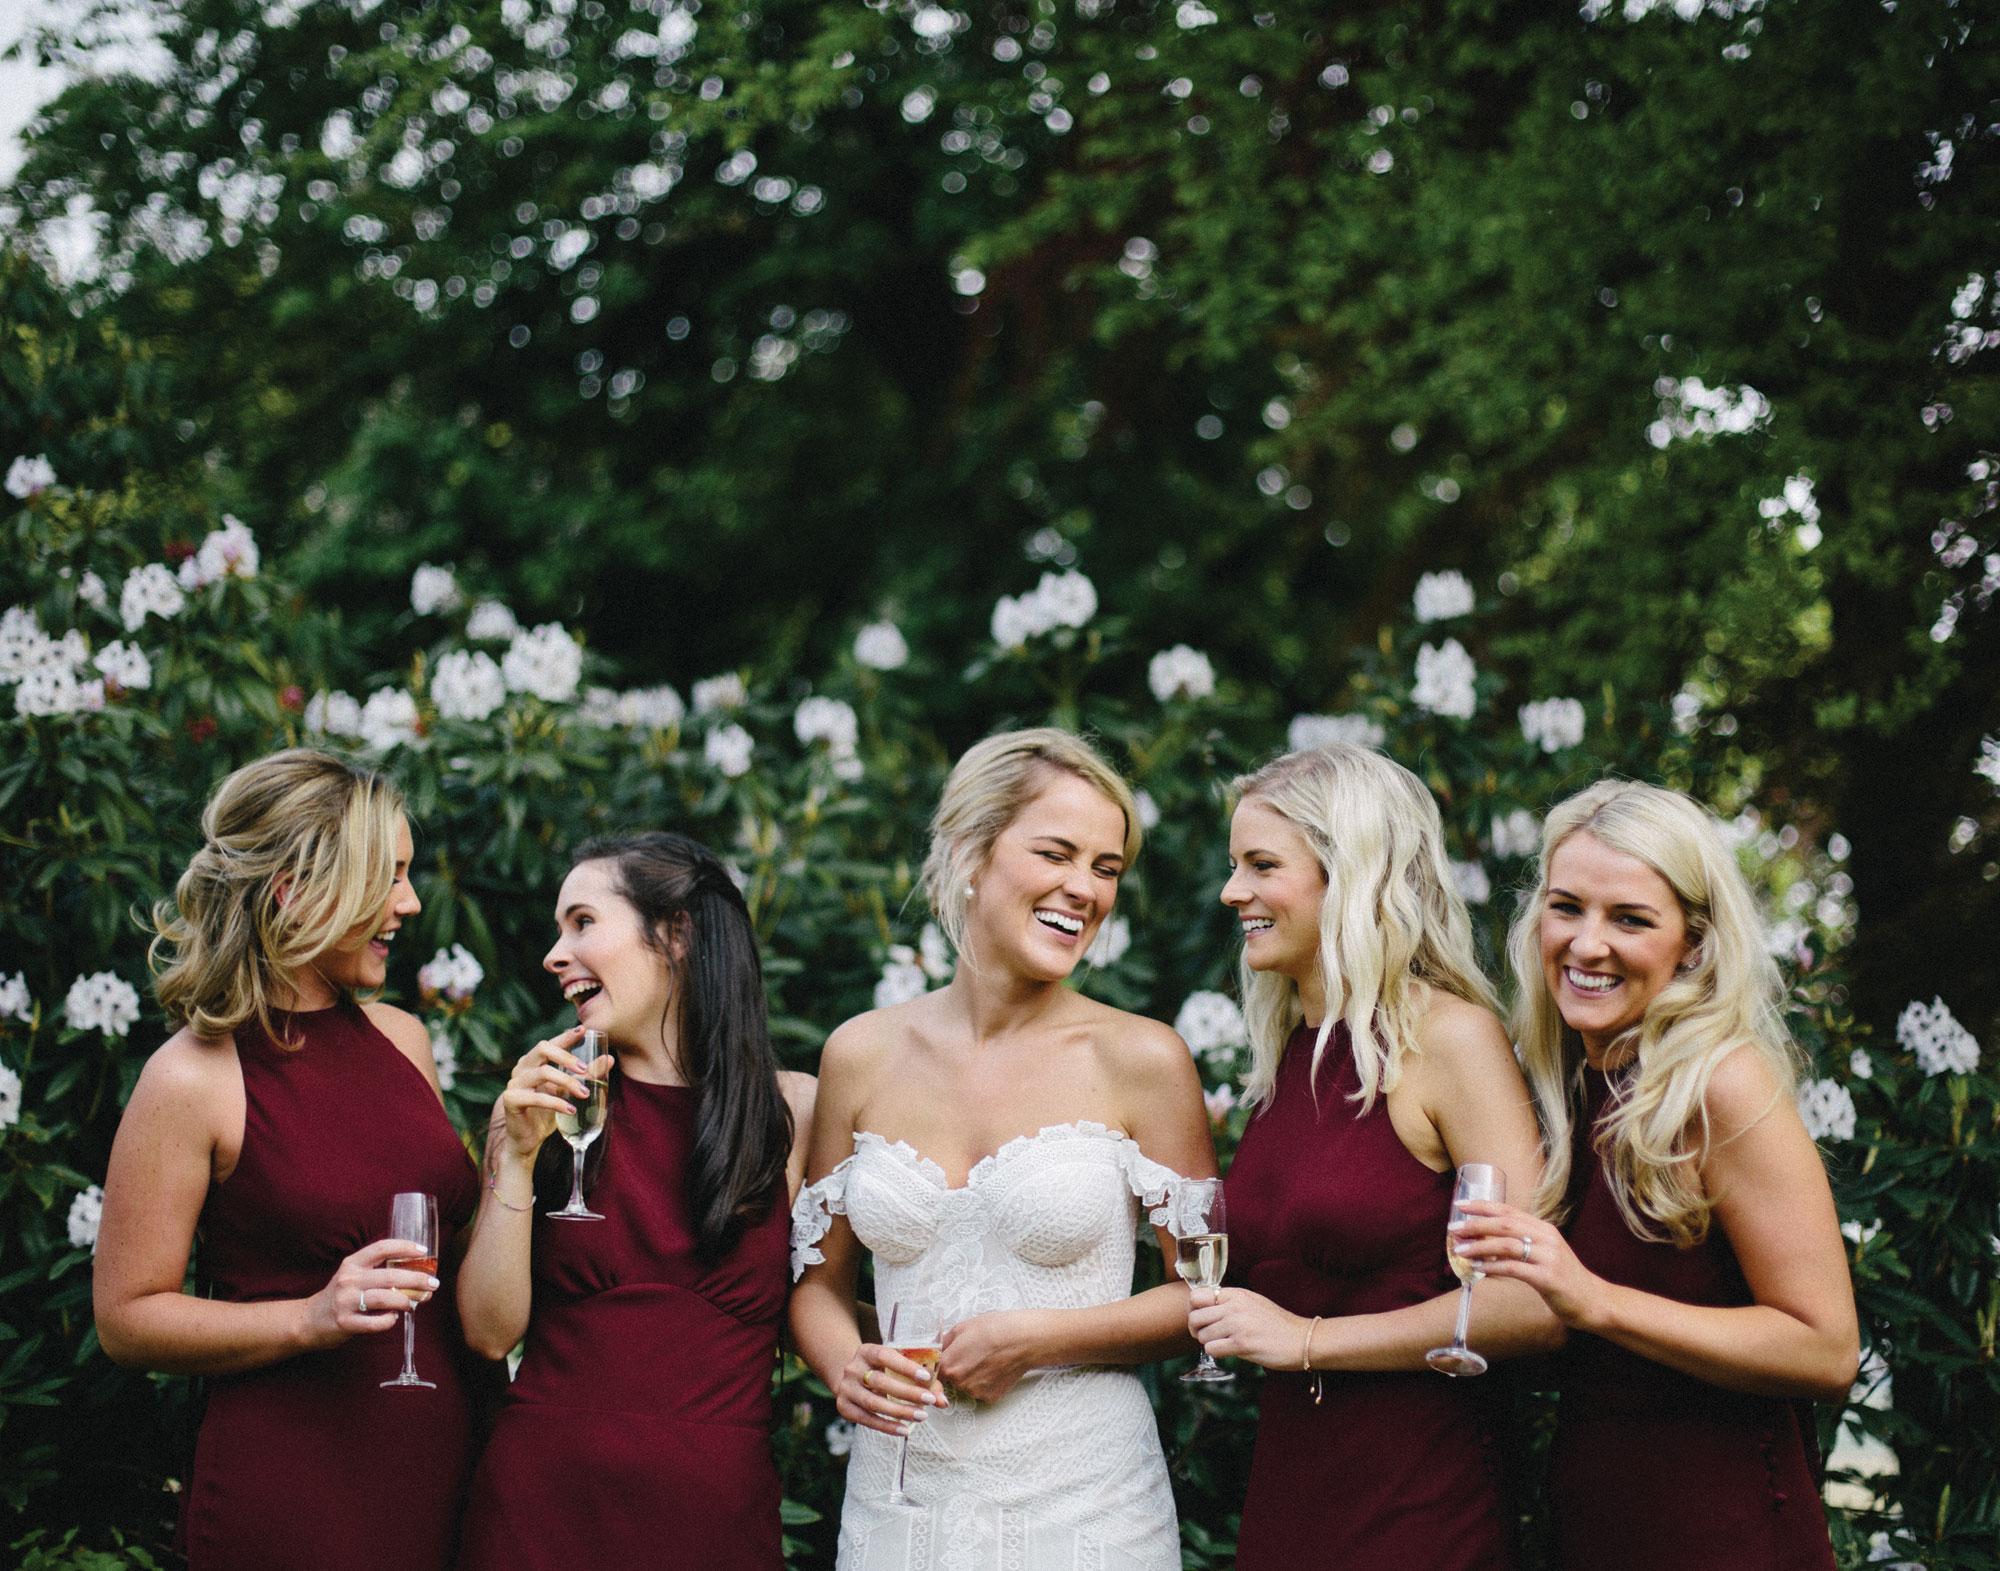 different-look-bridesmaid-dress-tullyverry-wedding-ireland.jpg